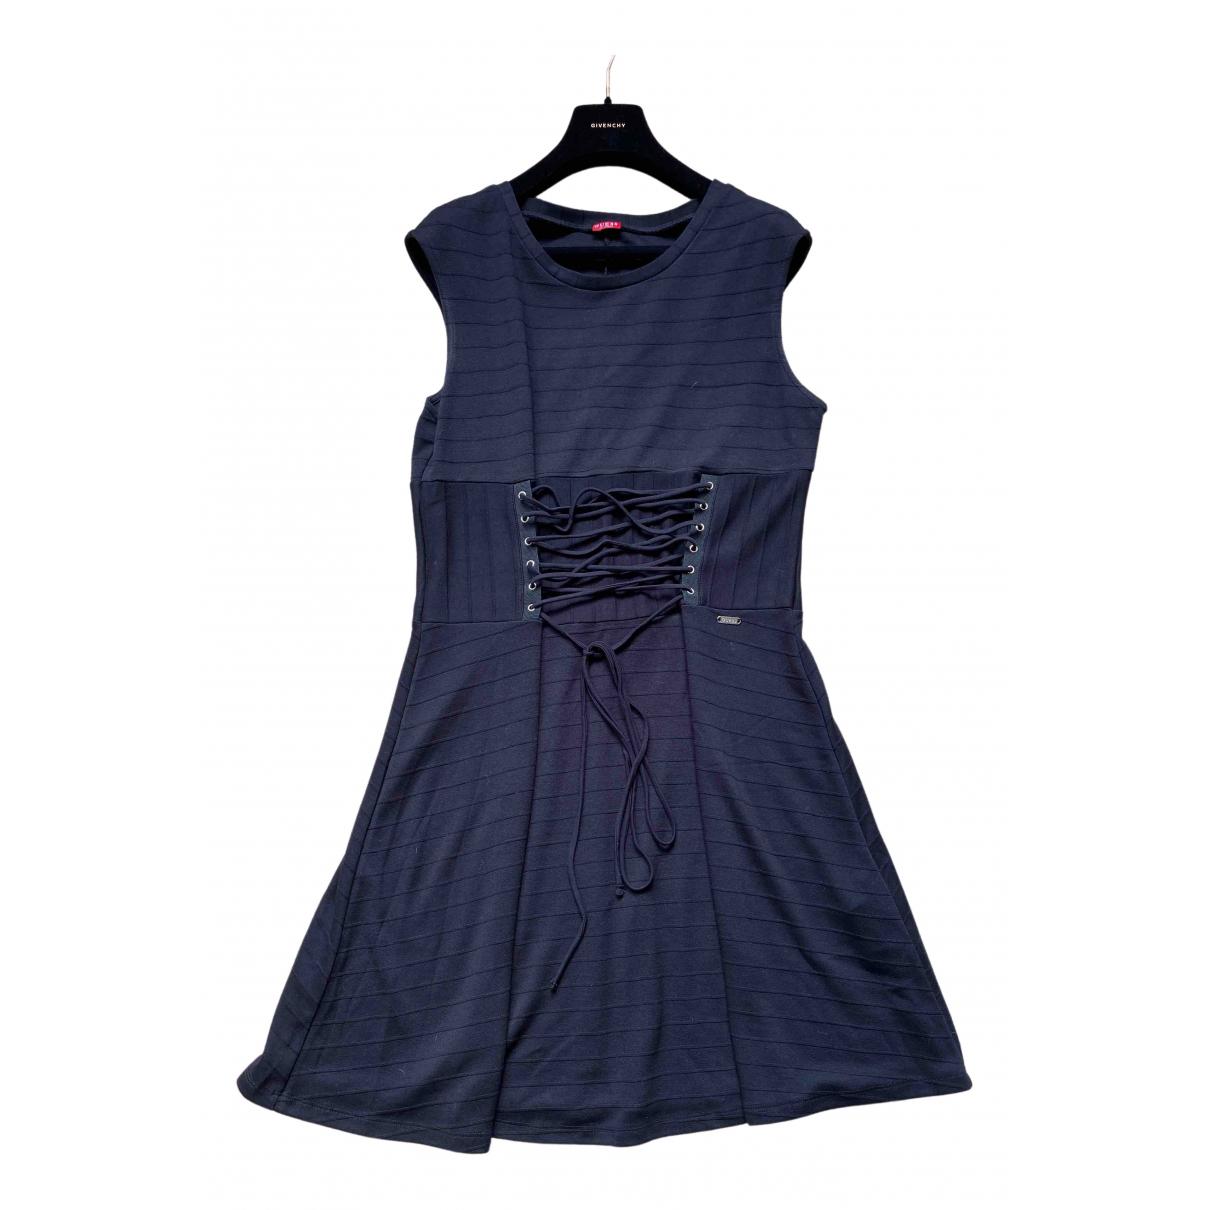 Guess \N Black dress for Women L International